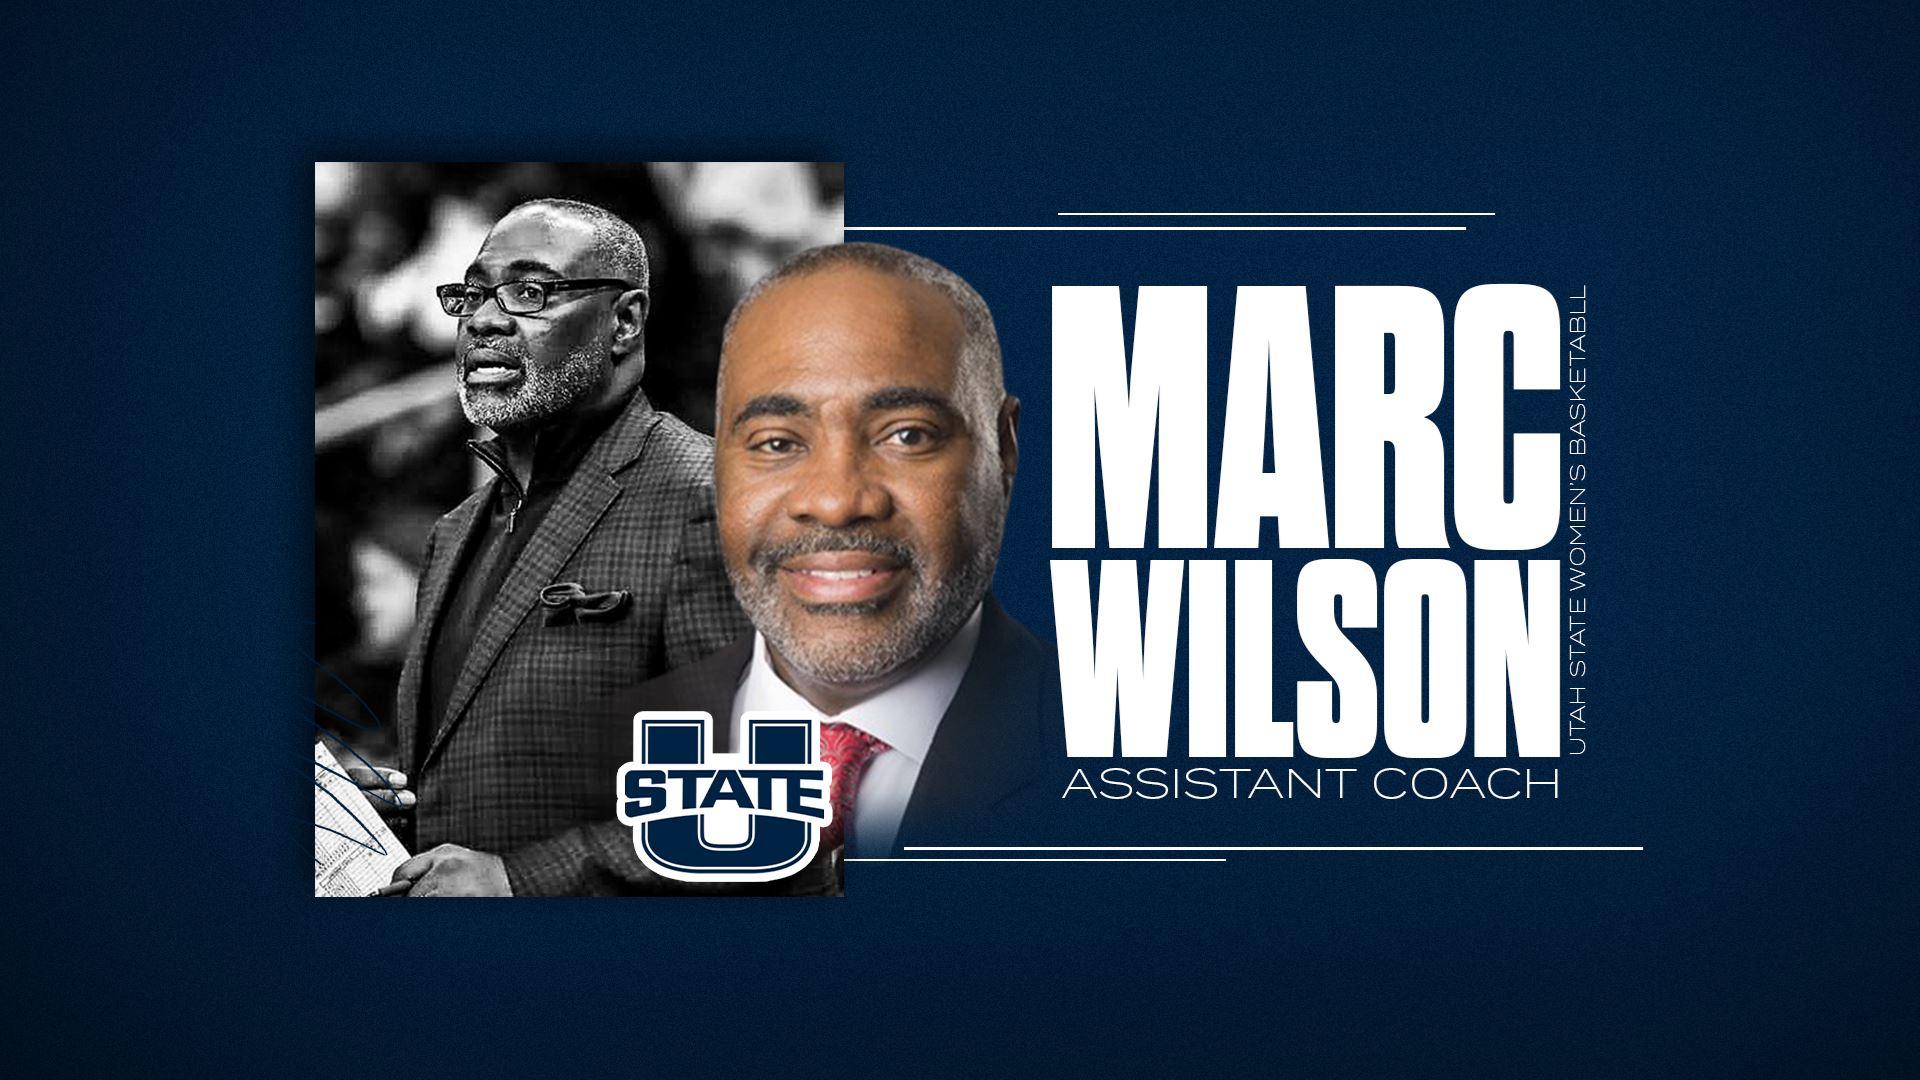 Utah State Women's Basketball Adds Marc Wilson as Assistant Coach - Women's Hoop Dirt